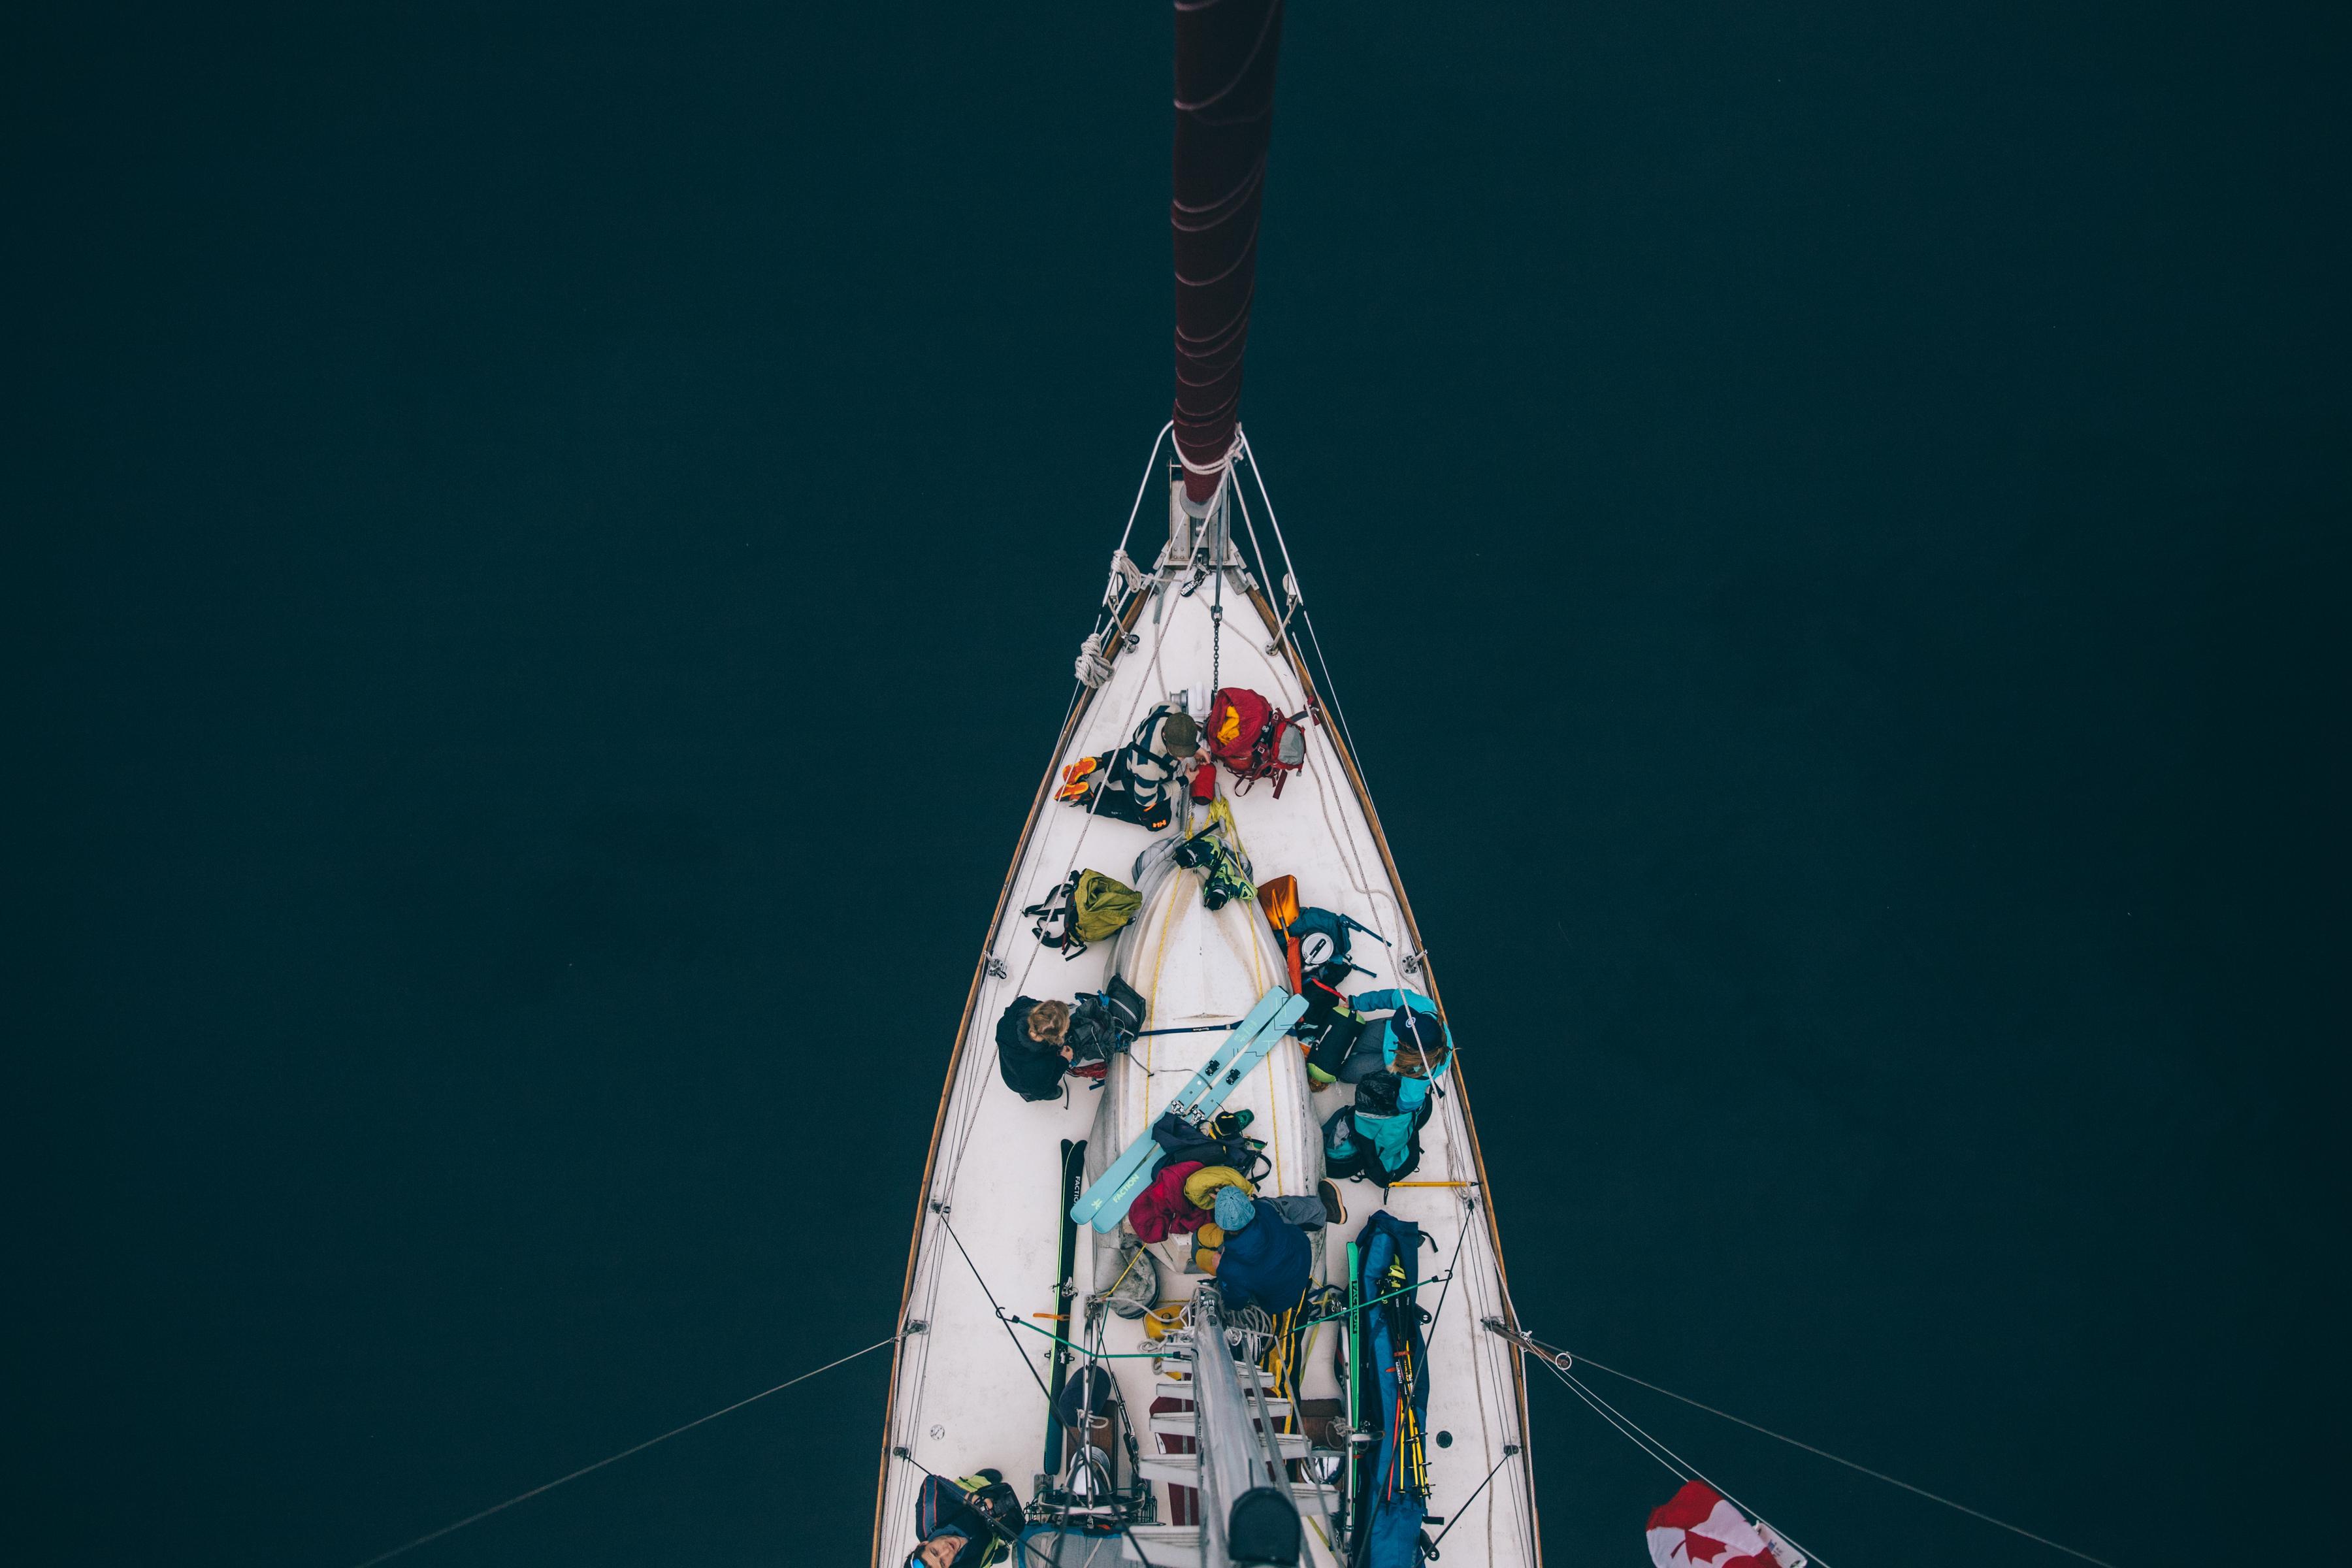 Preparing gear on the boat